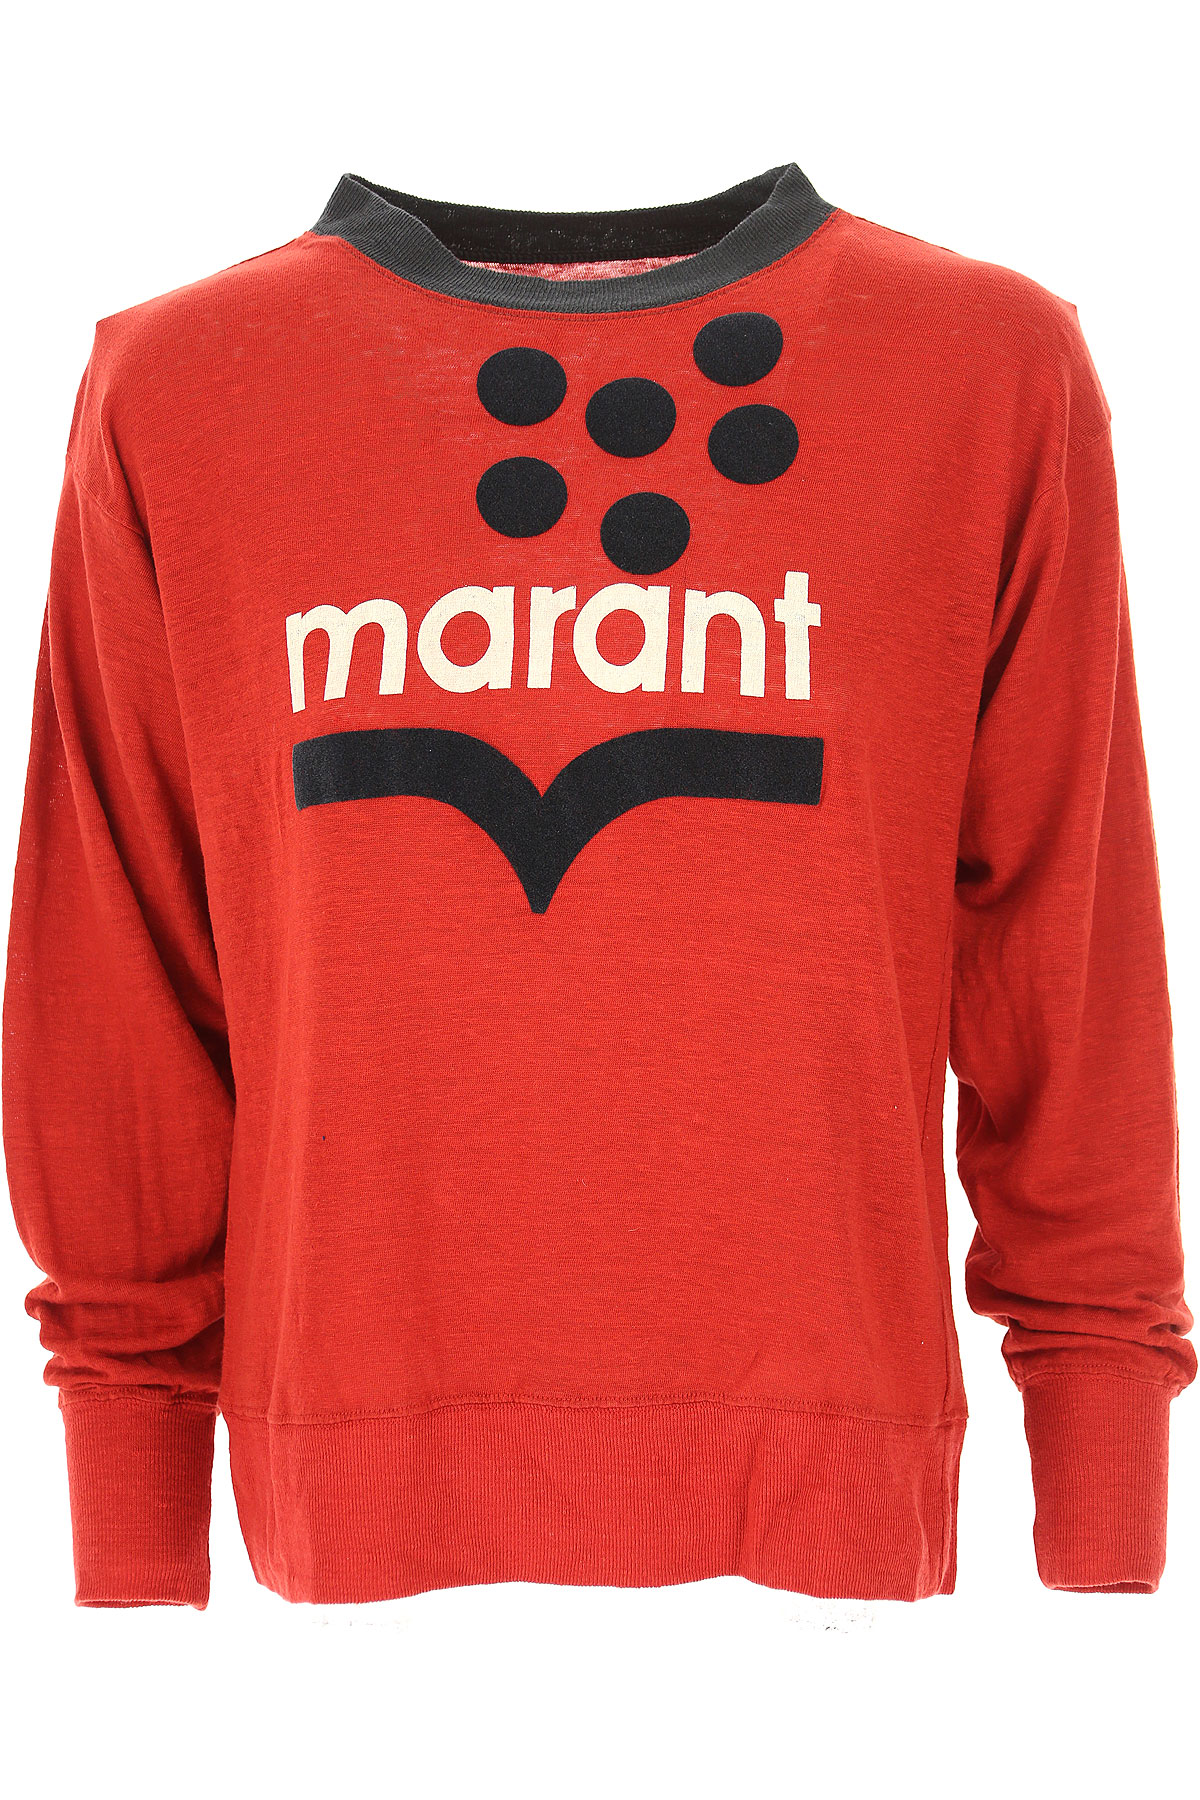 Isabel Marant T-Shirt for Women, Red, linen, 2017, 2 4 6 USA-473309